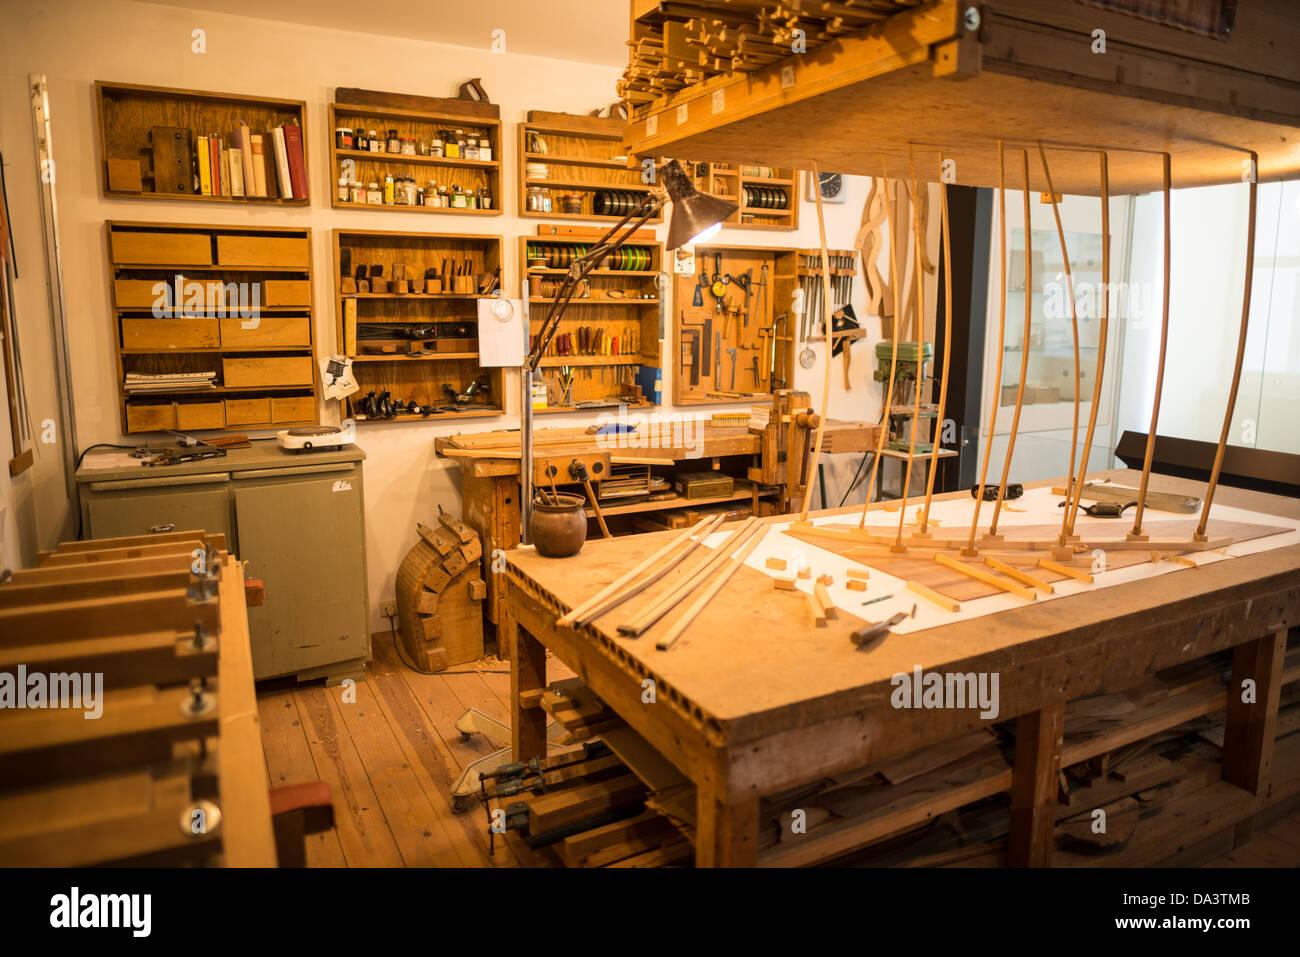 BRUSSELS, Belgium - The Musee des Instruments de Musique (Musical Instrument Museum) in Brussels contains exhibits Stock Photo